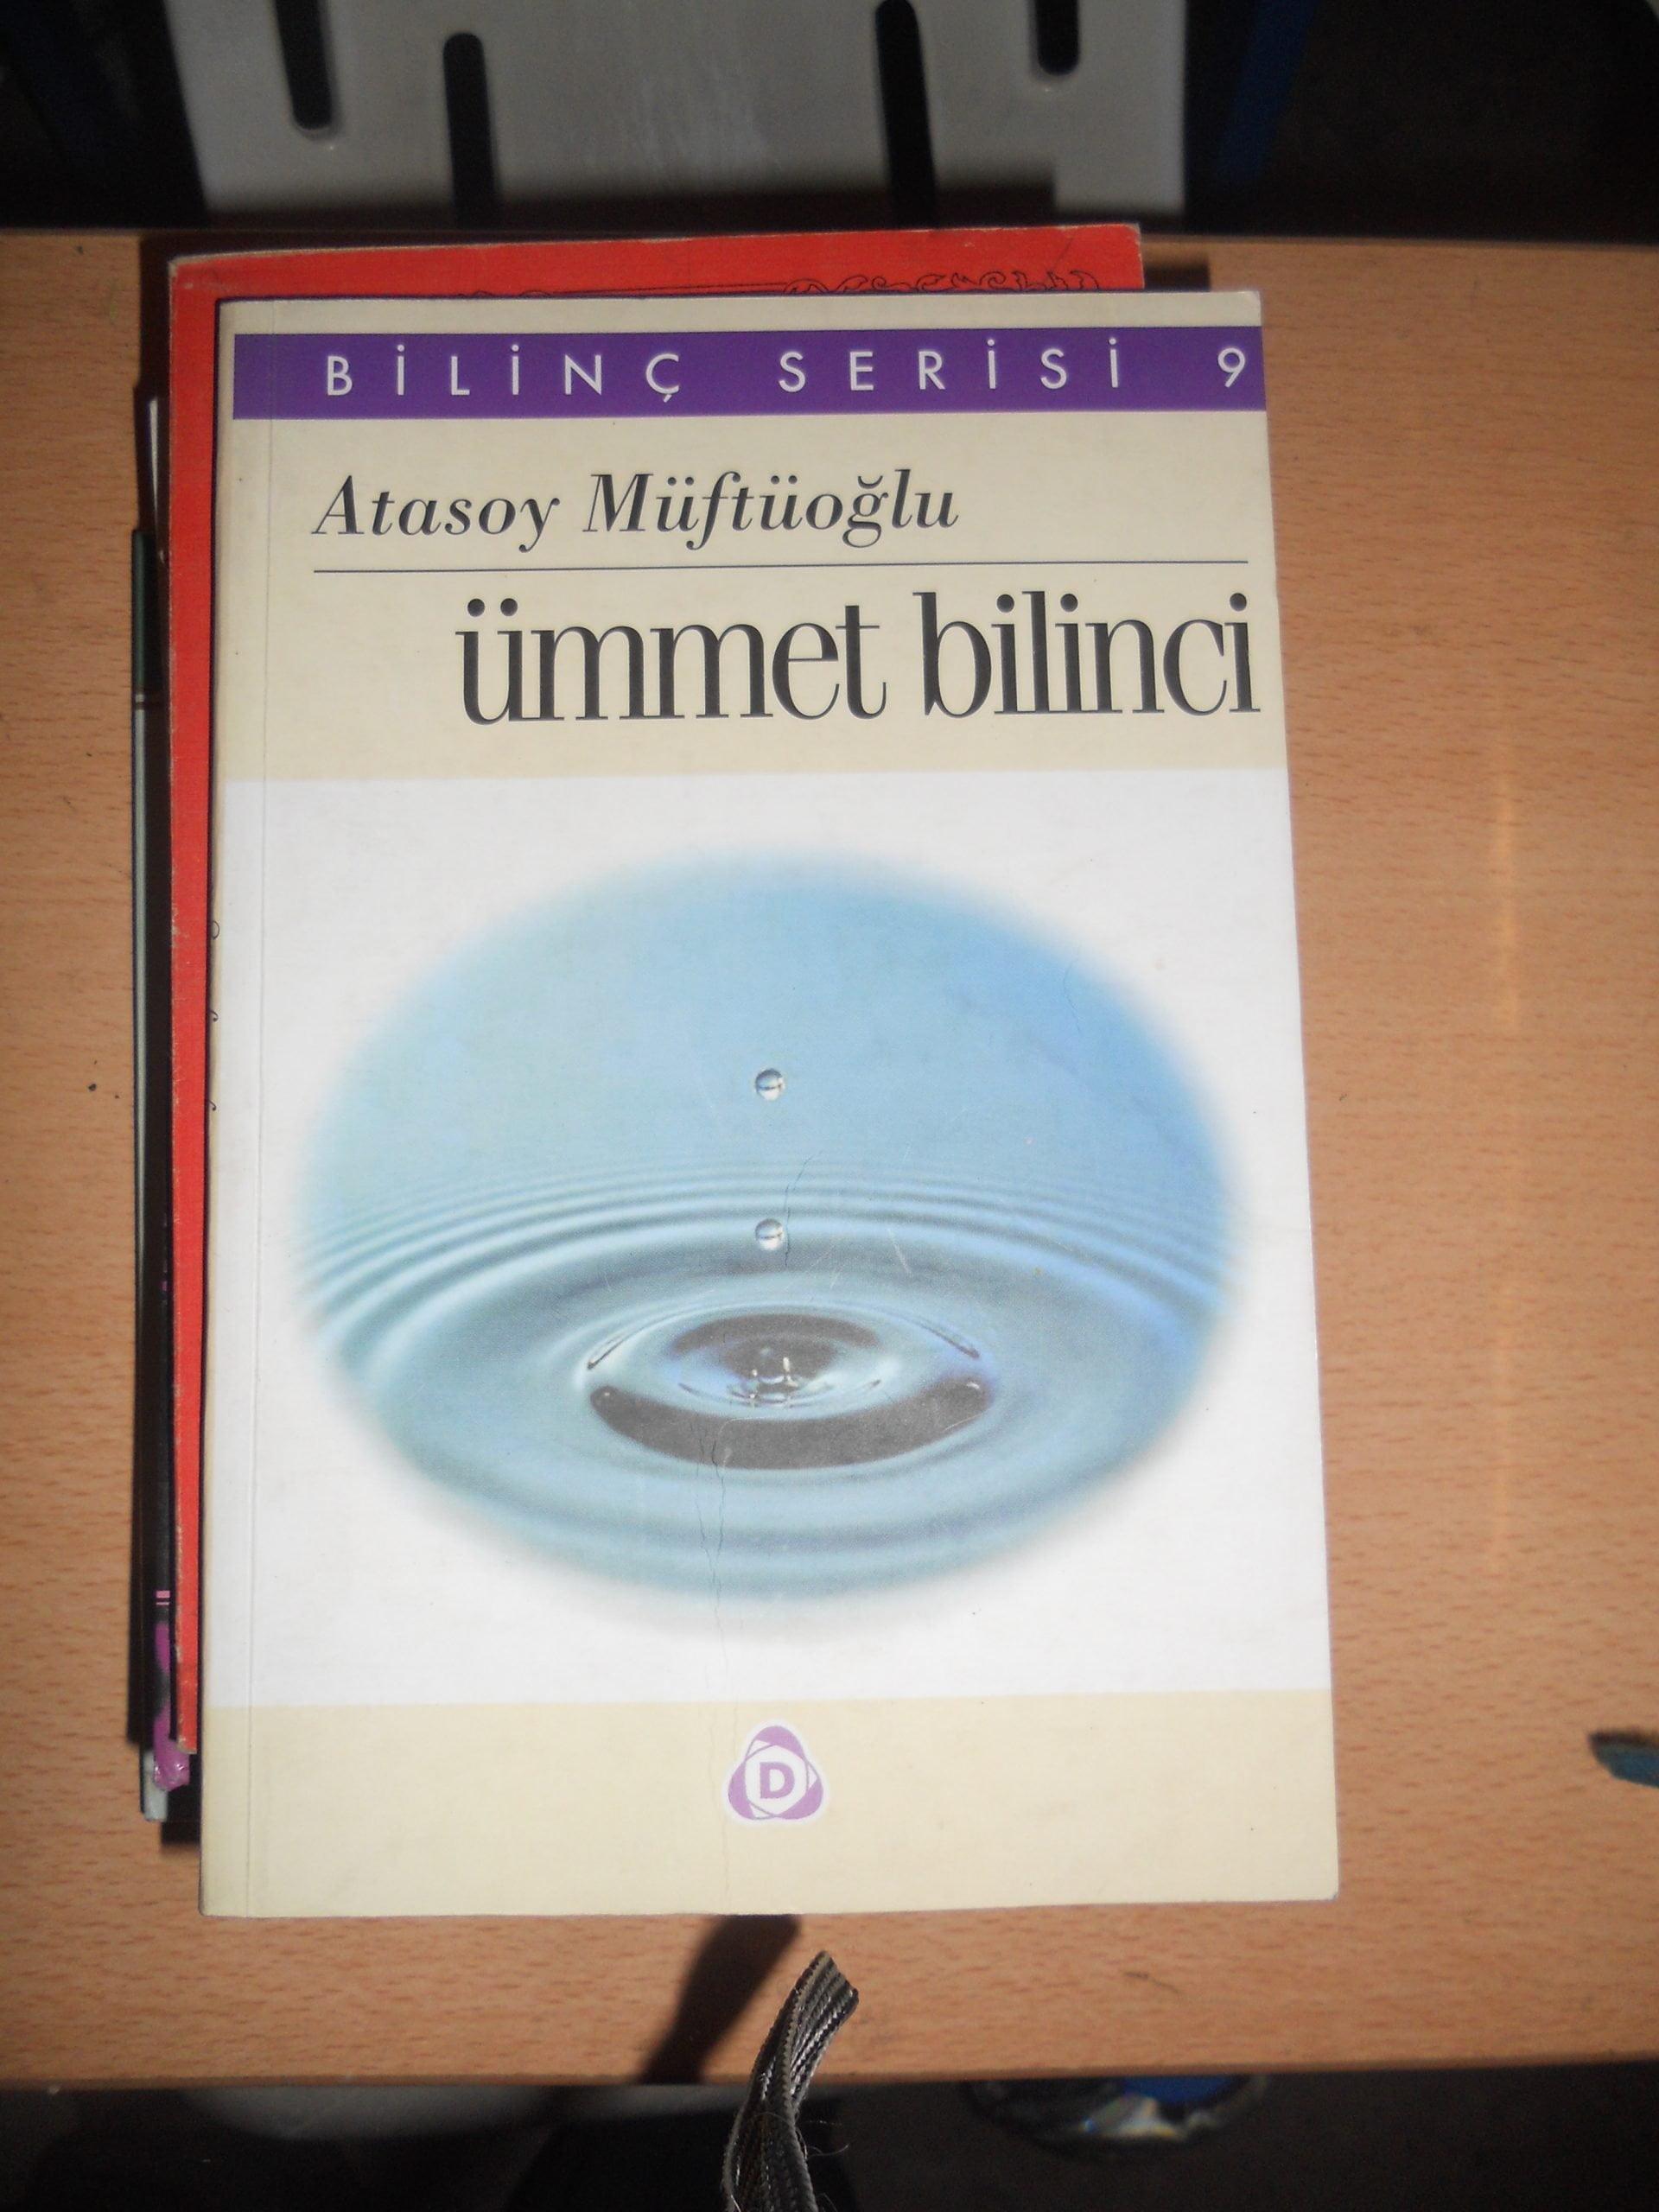 ÜMMET BİLİNCİ/Atasoy Müftüoğlu/ 10 tl